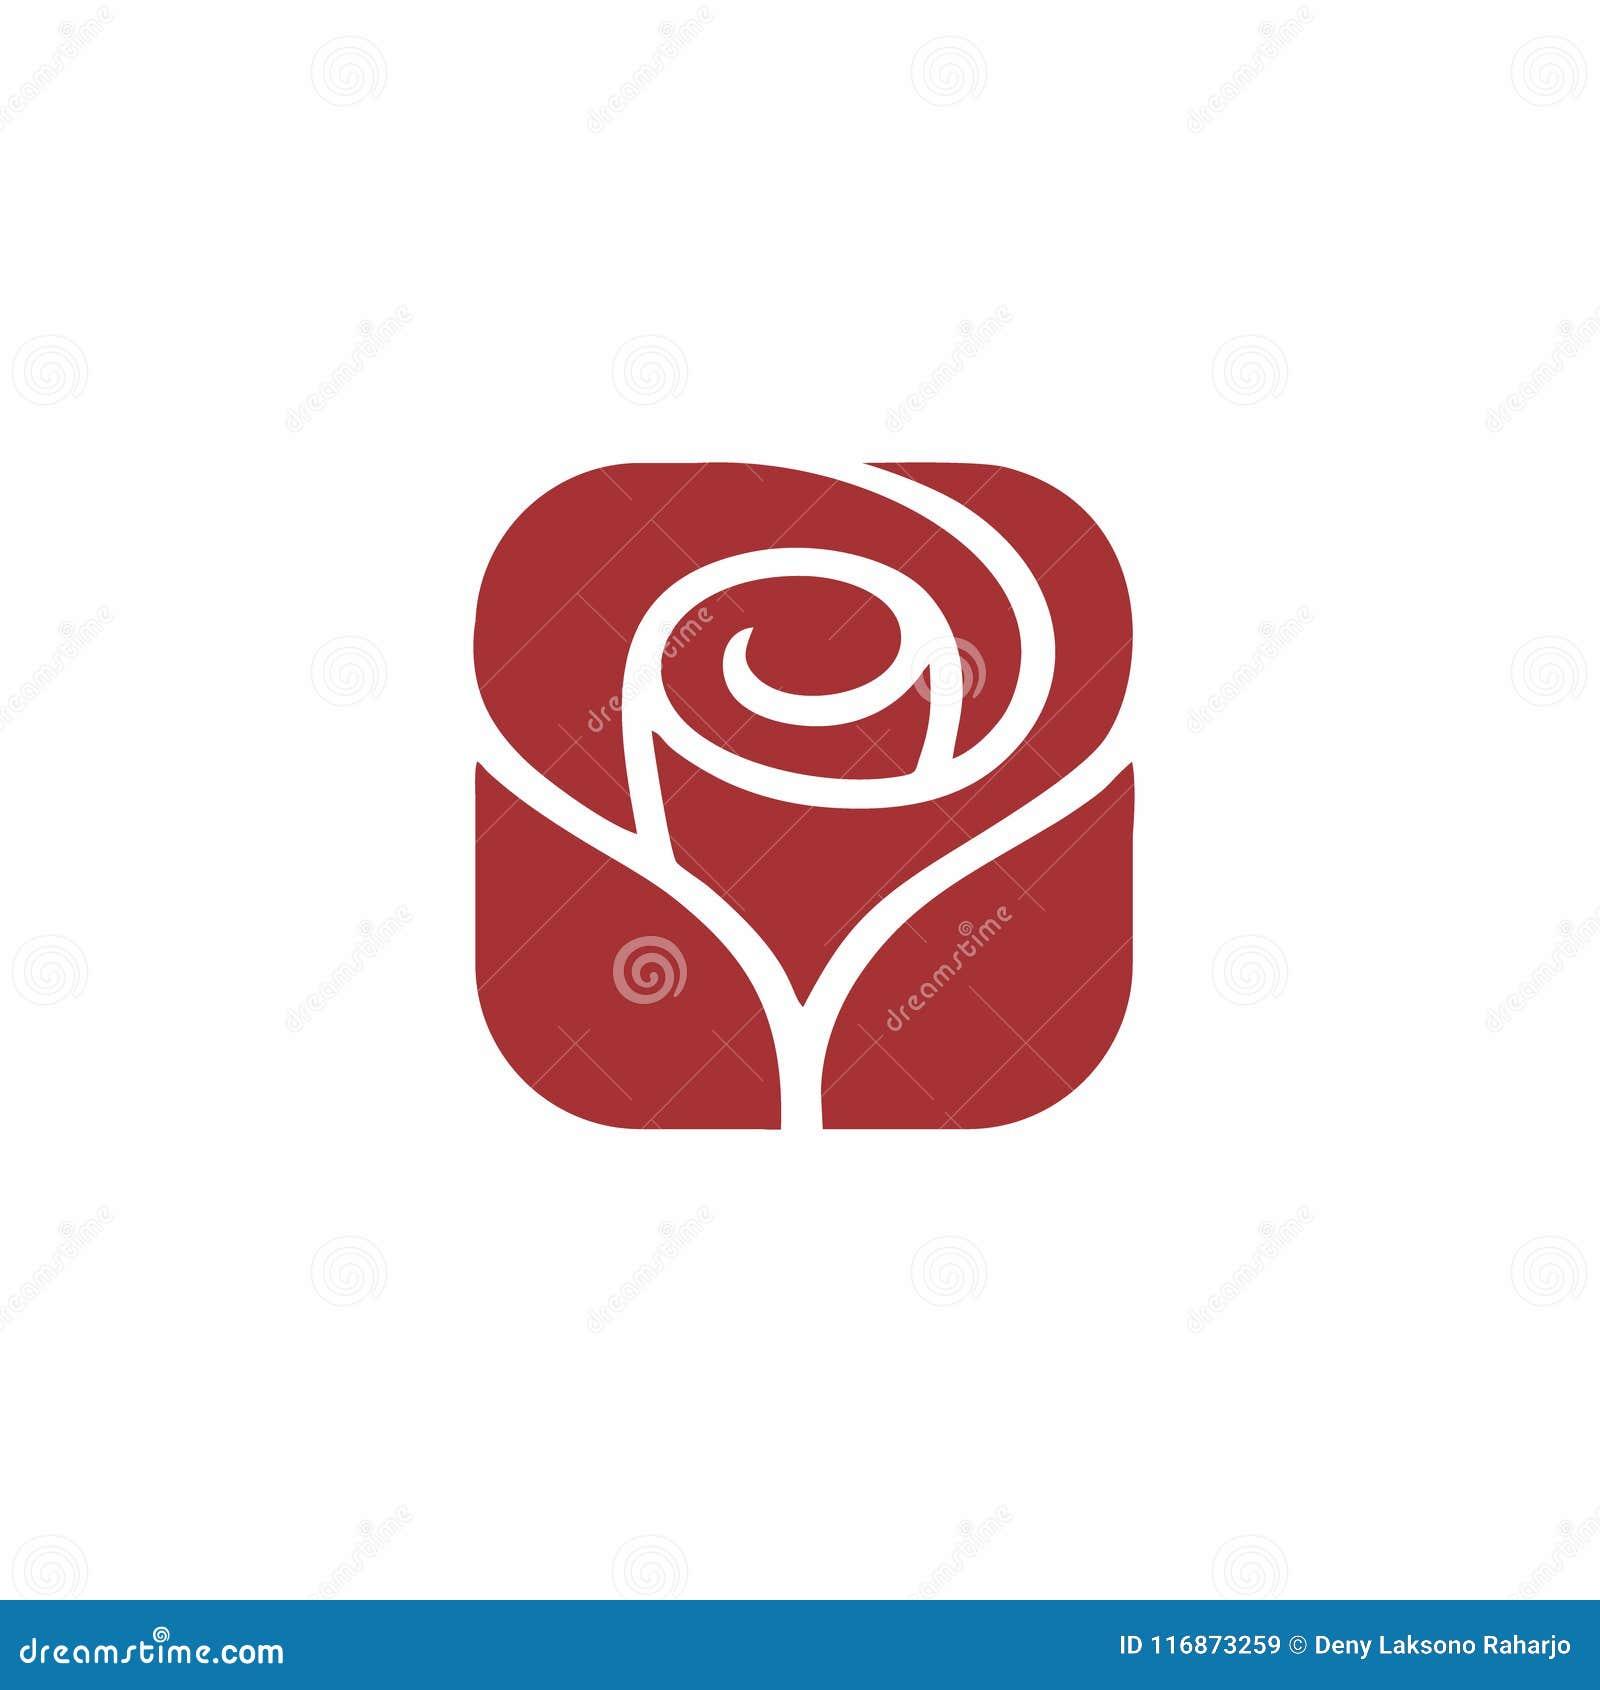 simple flower design inspiration for nature theme stock illustration rh dreamstime com